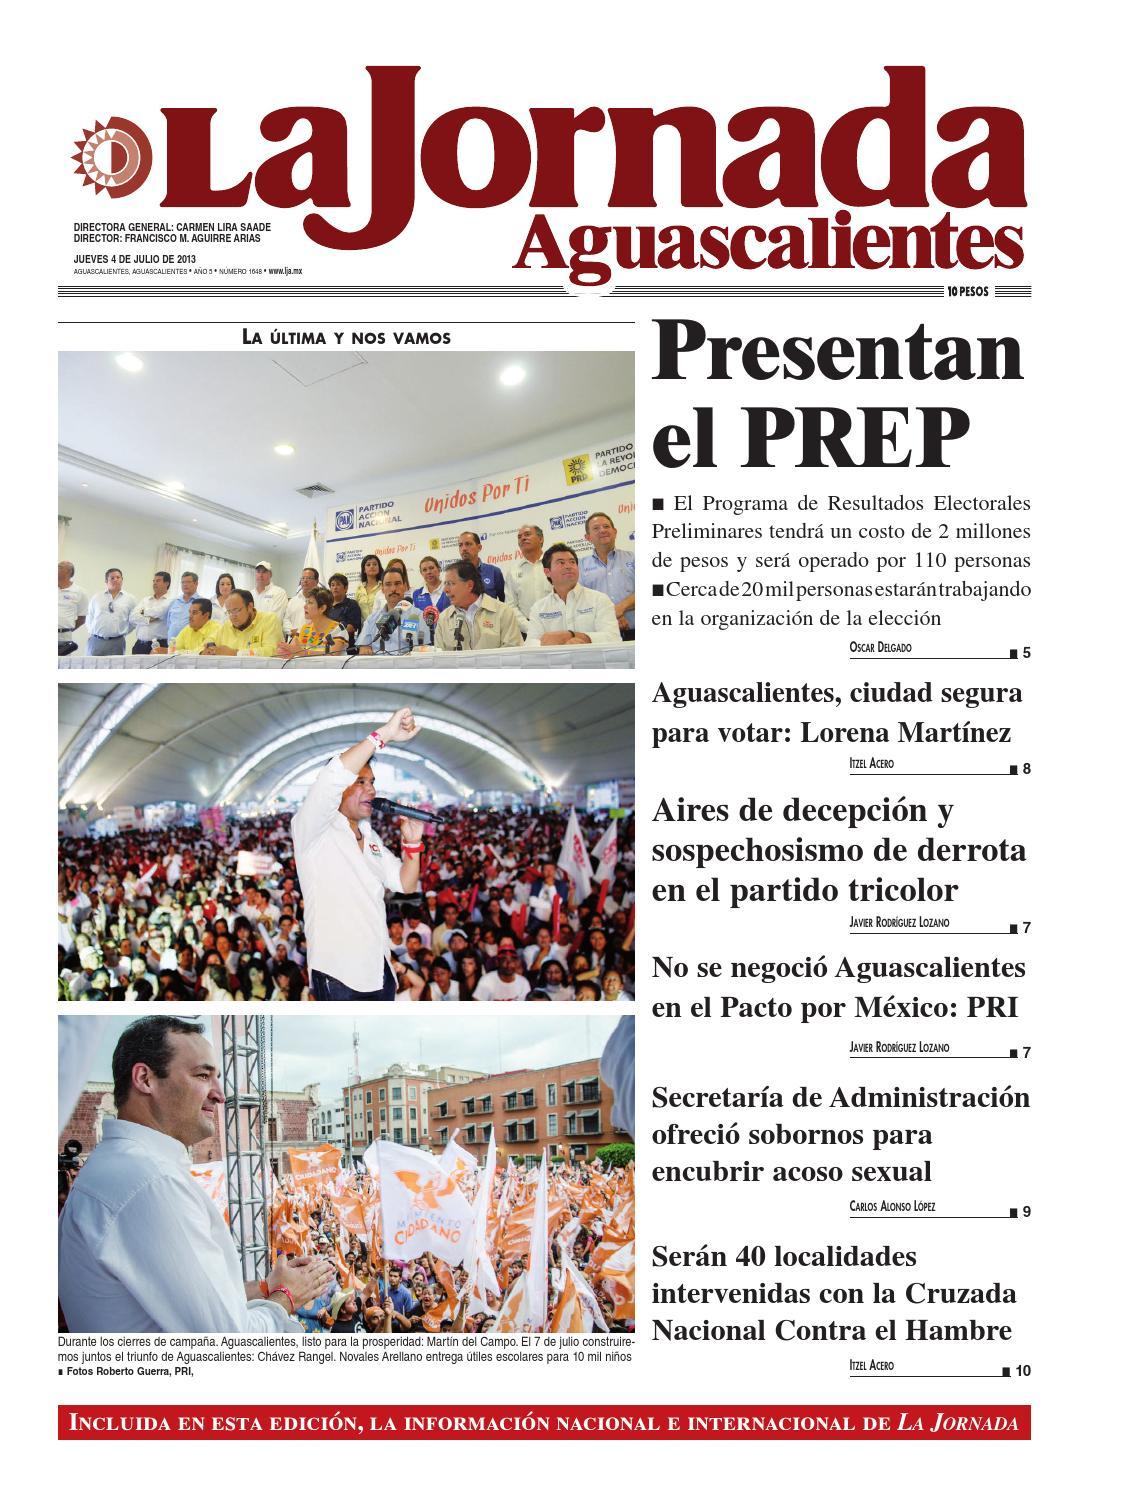 LJA04072013 by La Jornada Aguascalientes - issuu